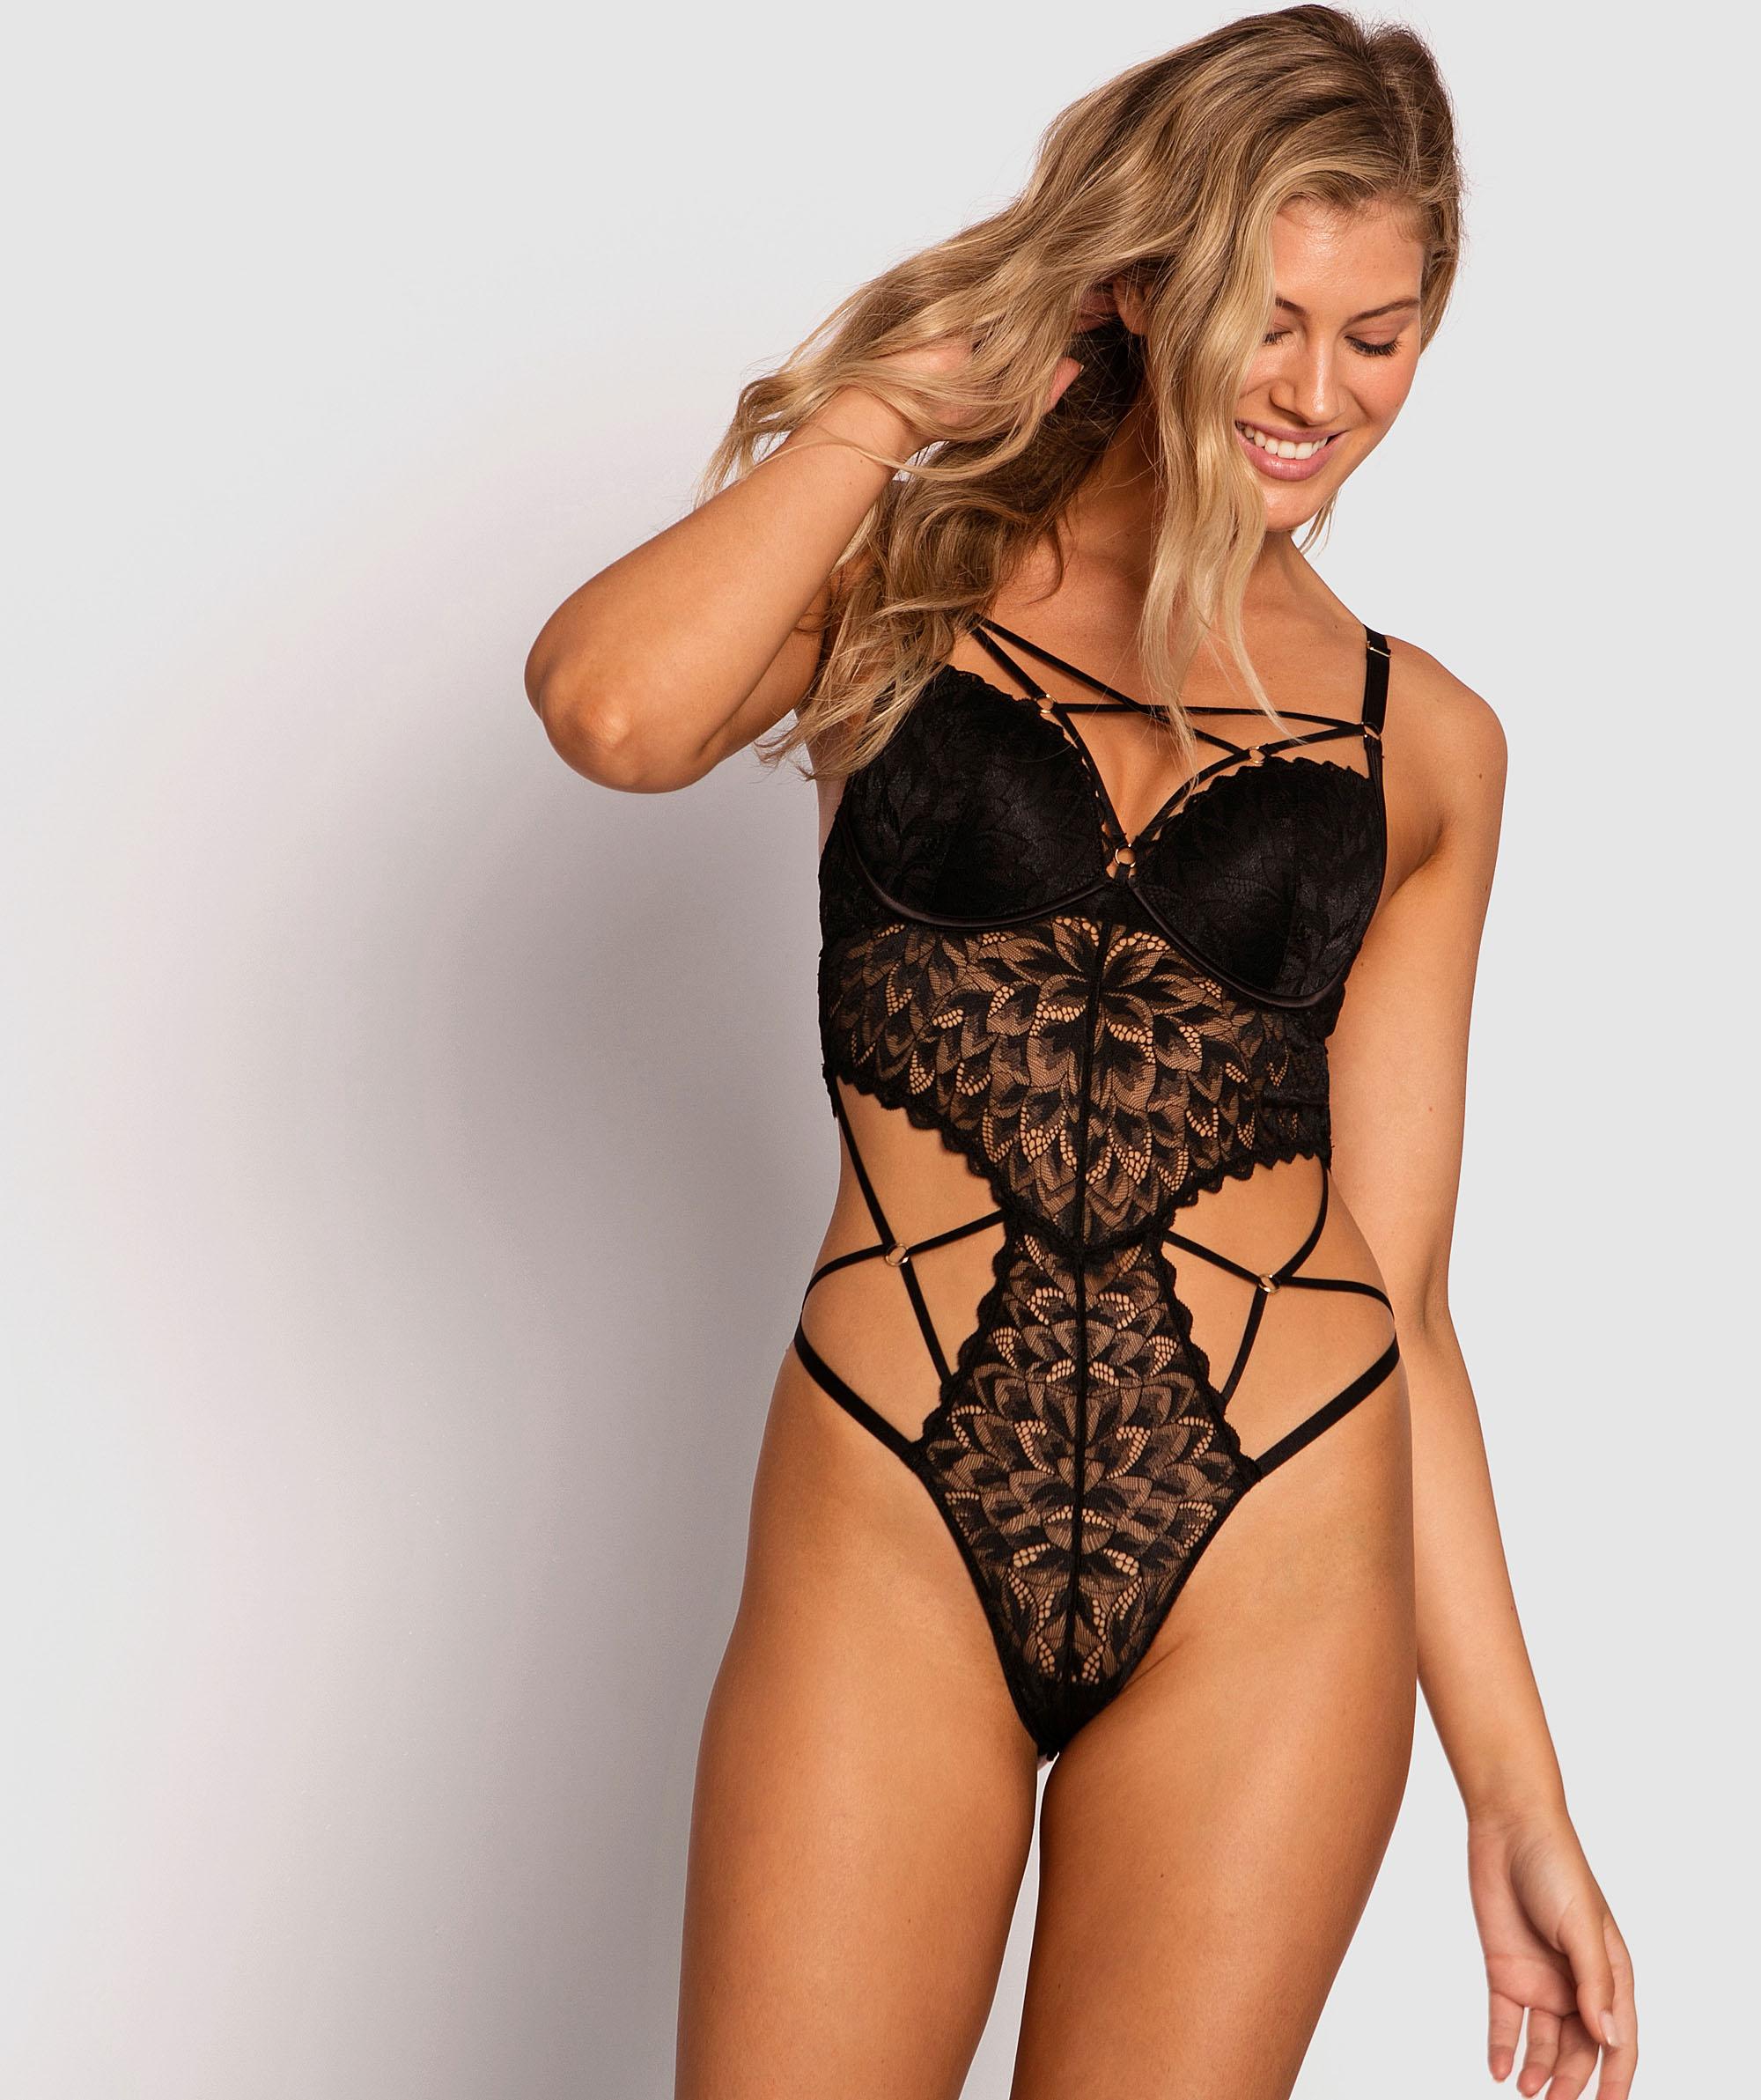 Temptation Push Up Bodysuit - Black